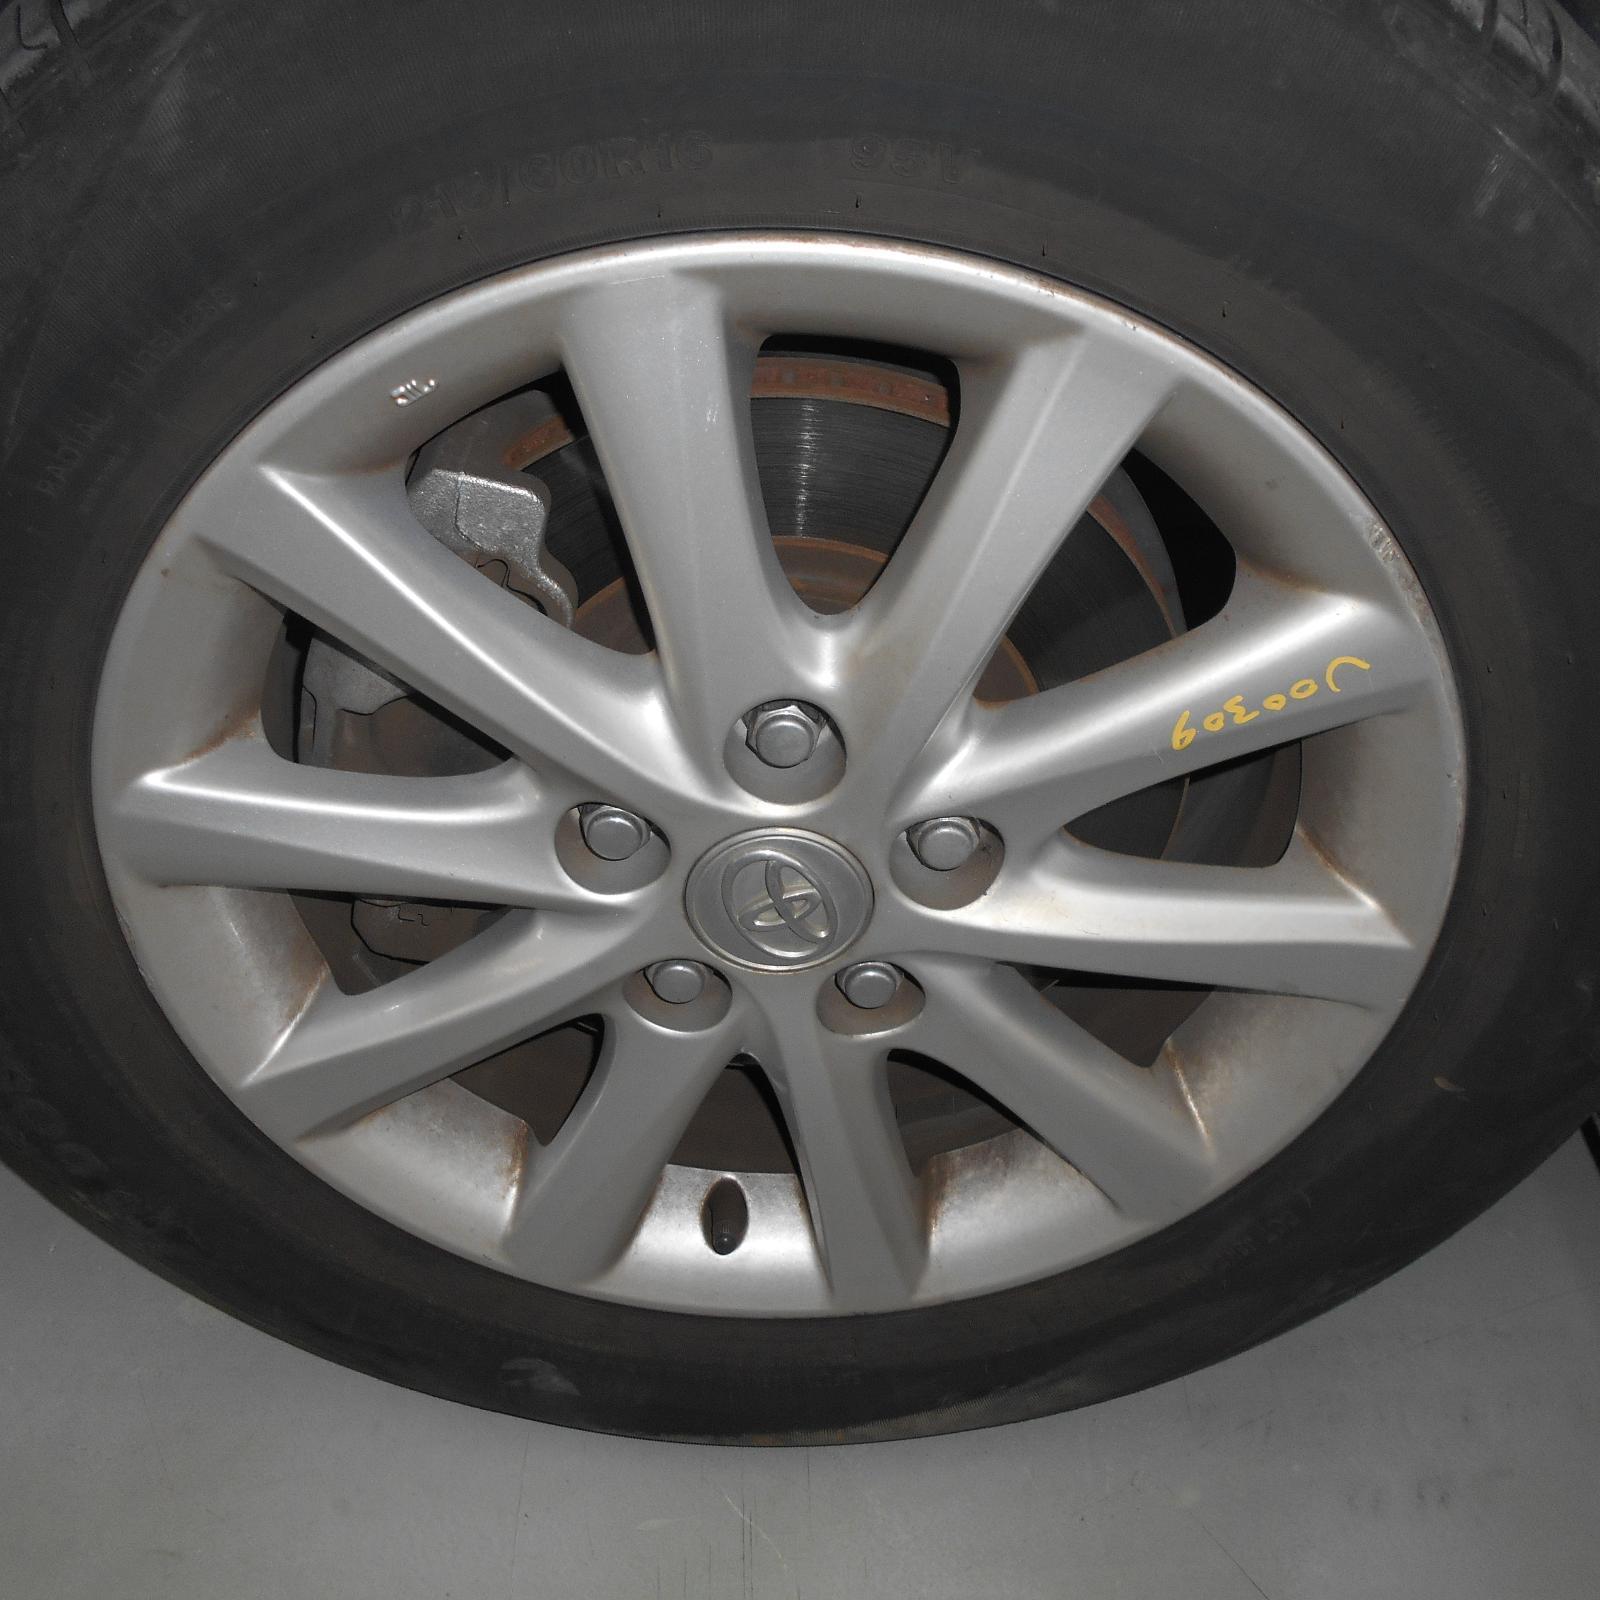 TOYOTA CAMRY, Wheel Mag, FACTORY, 16X6.5IN, ACV40/AHV40, 10 SPOKE, 06/06-11/11